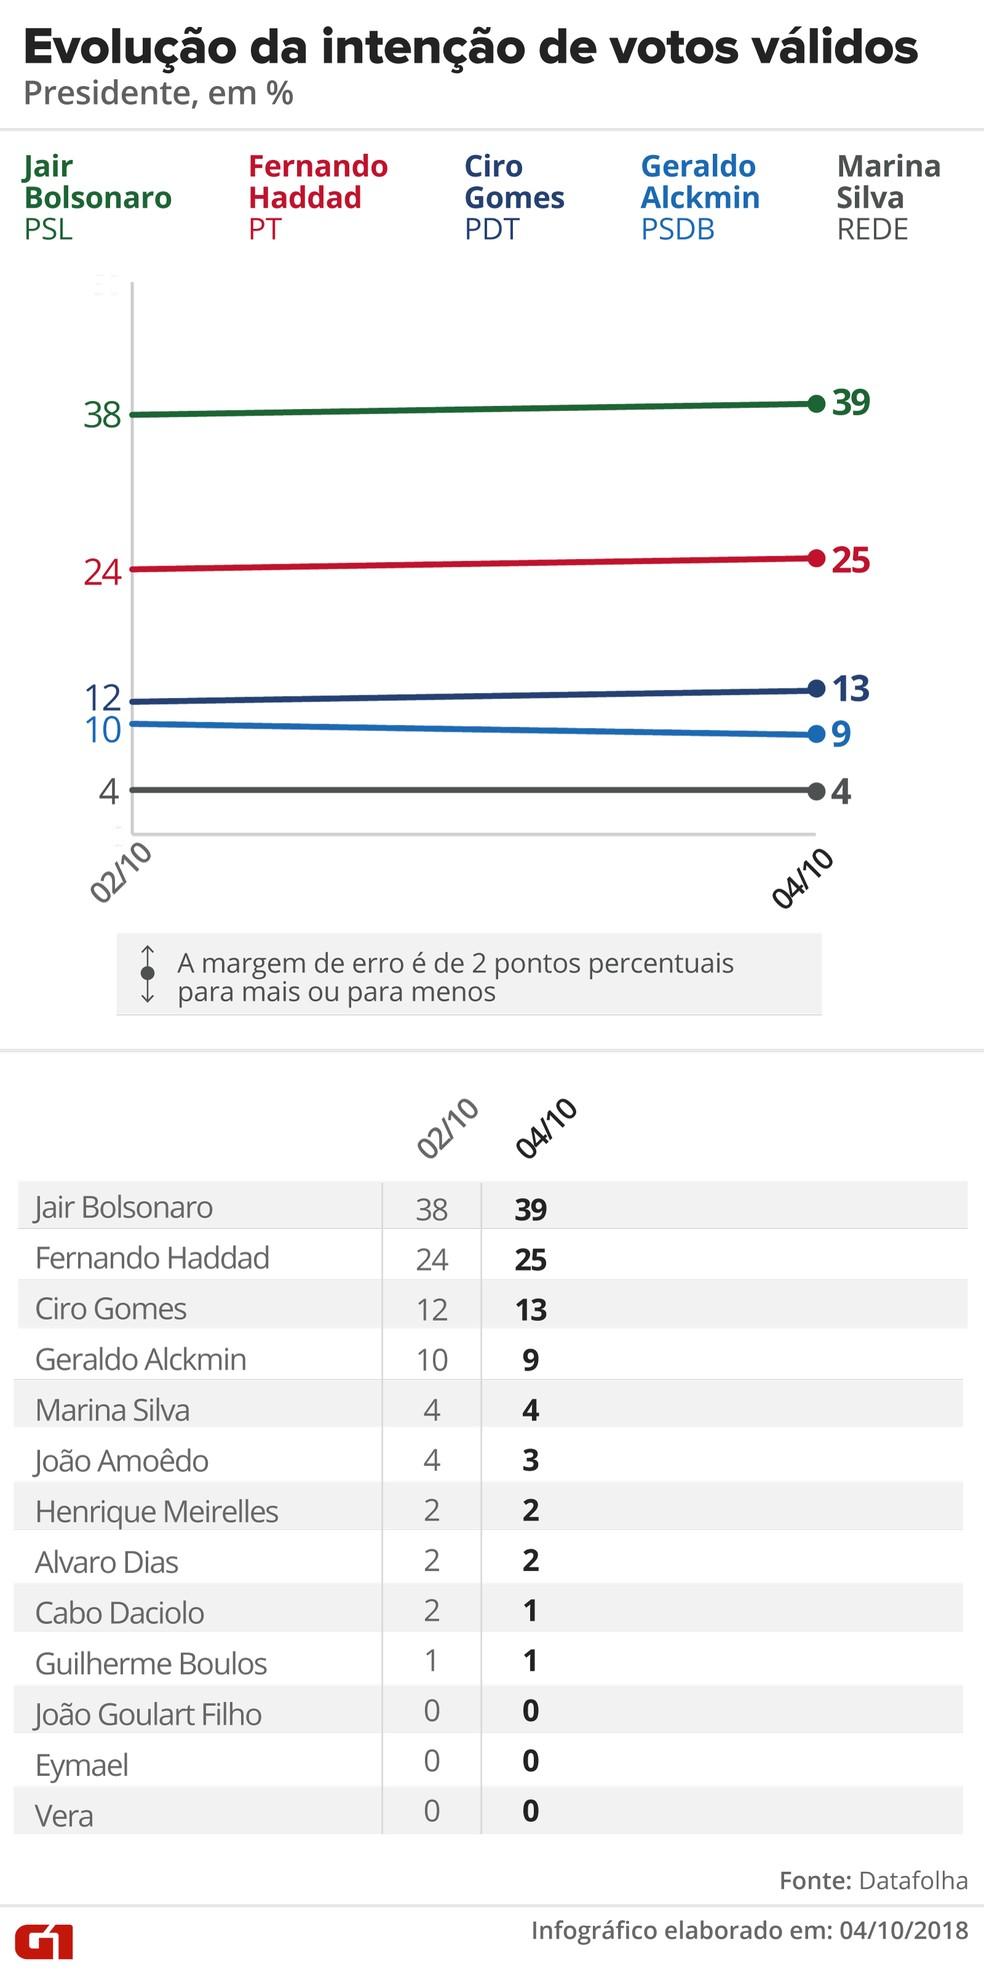 Nova pesquisa do Datafolha põe Bolsonaro com 35%; Haddad, 22%; Ciro, 11% e Alckmin, 8%